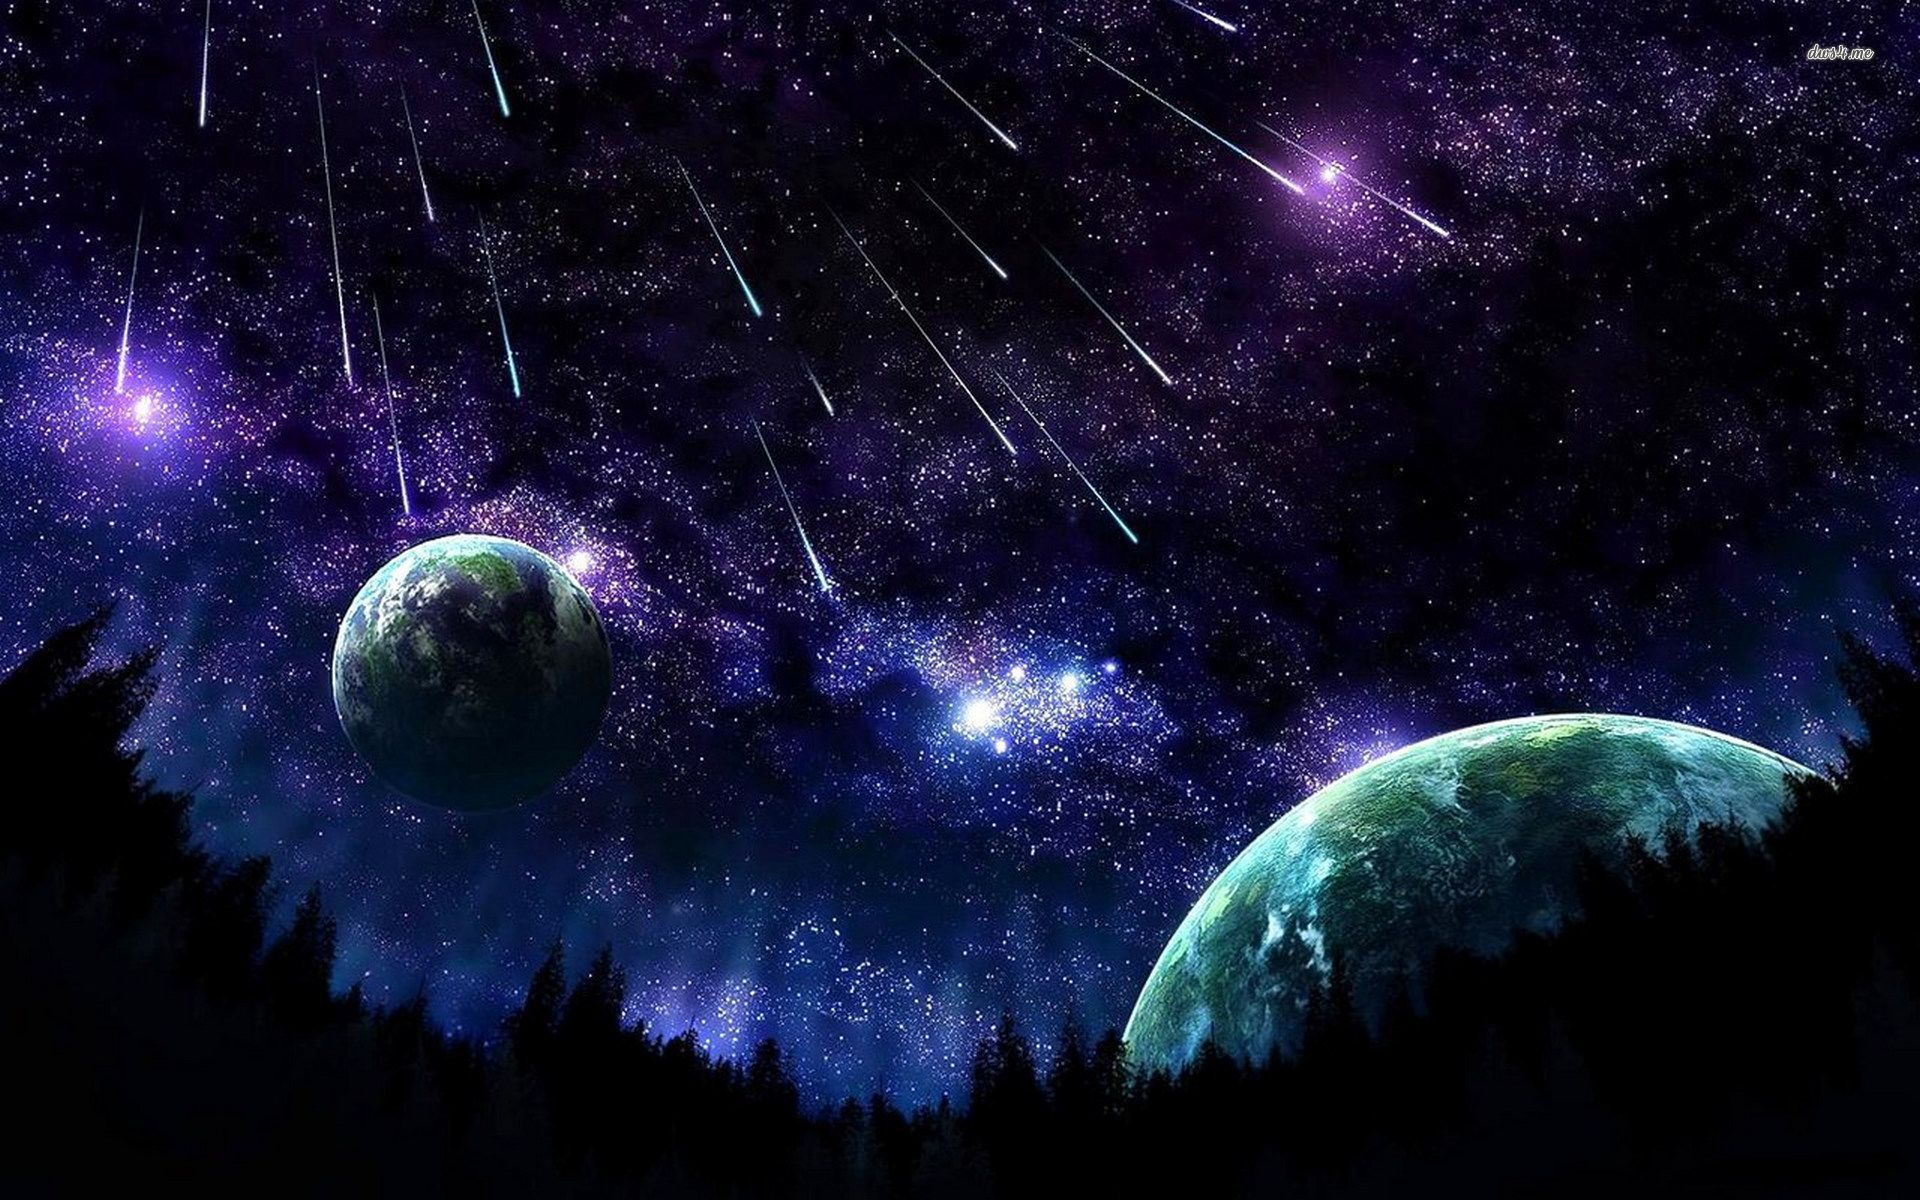 Night Sky Wallpapers   Full HD wallpaper search 1920x1200